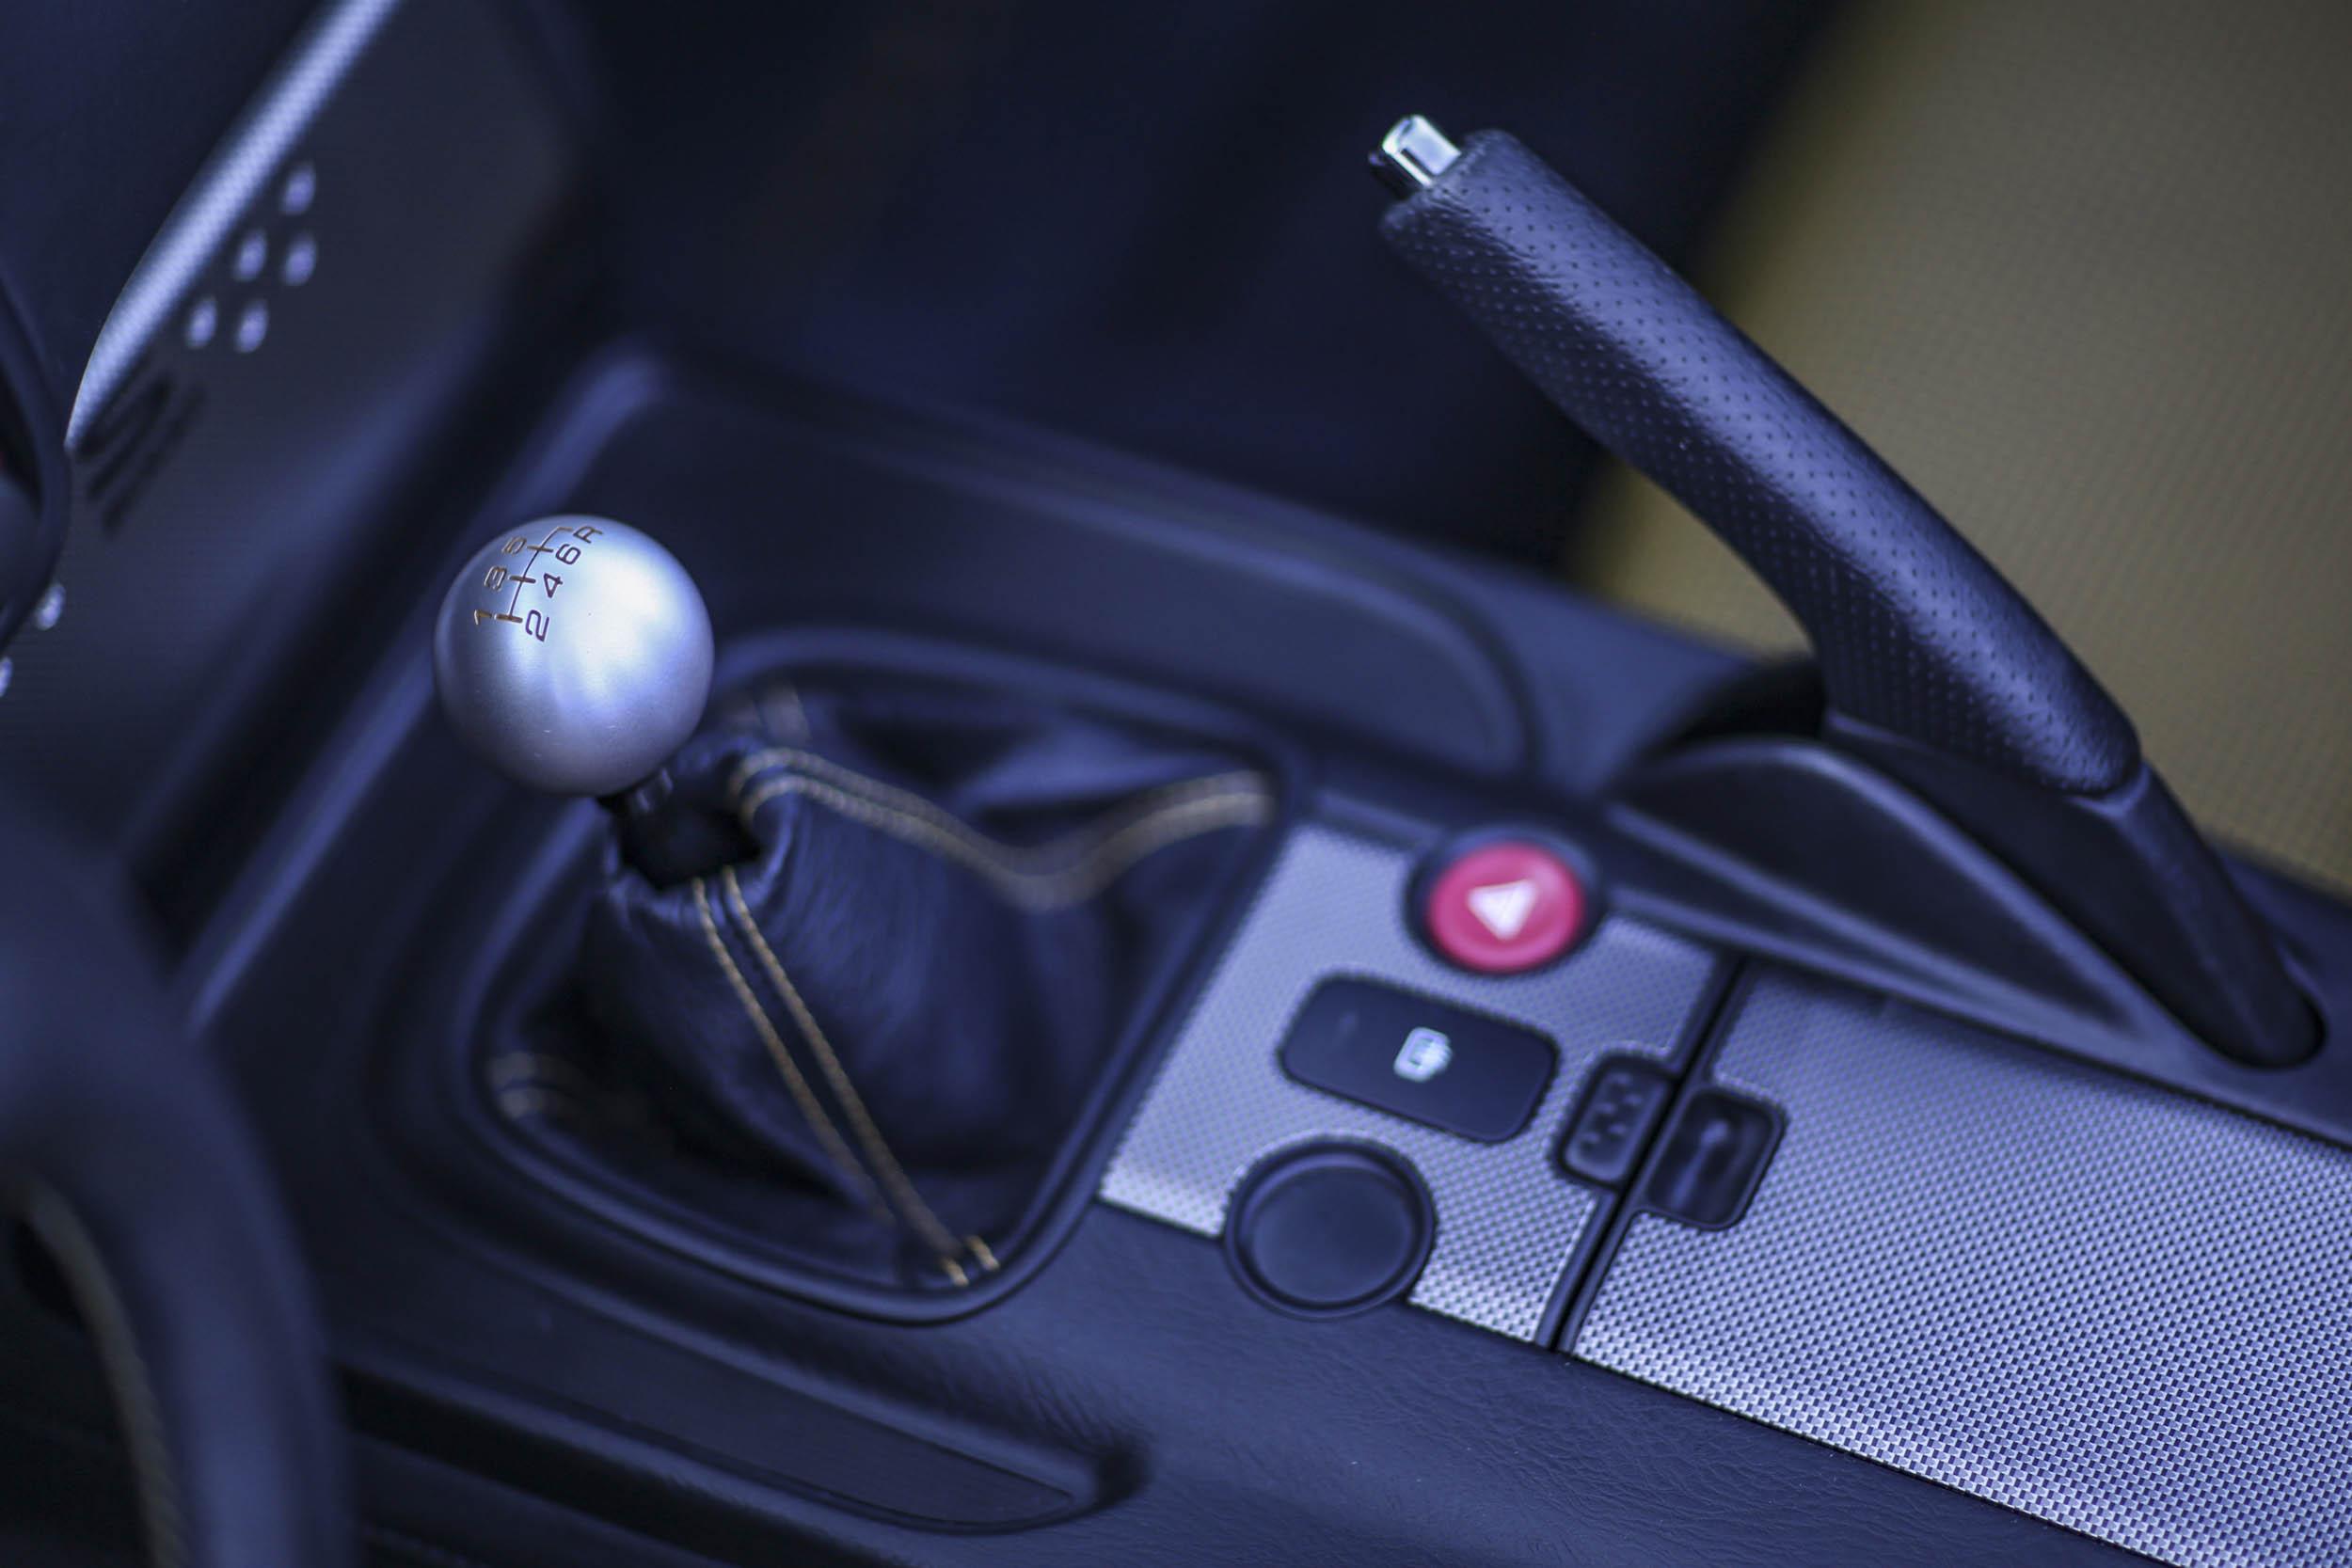 Honda S2000 shifter manual transmission